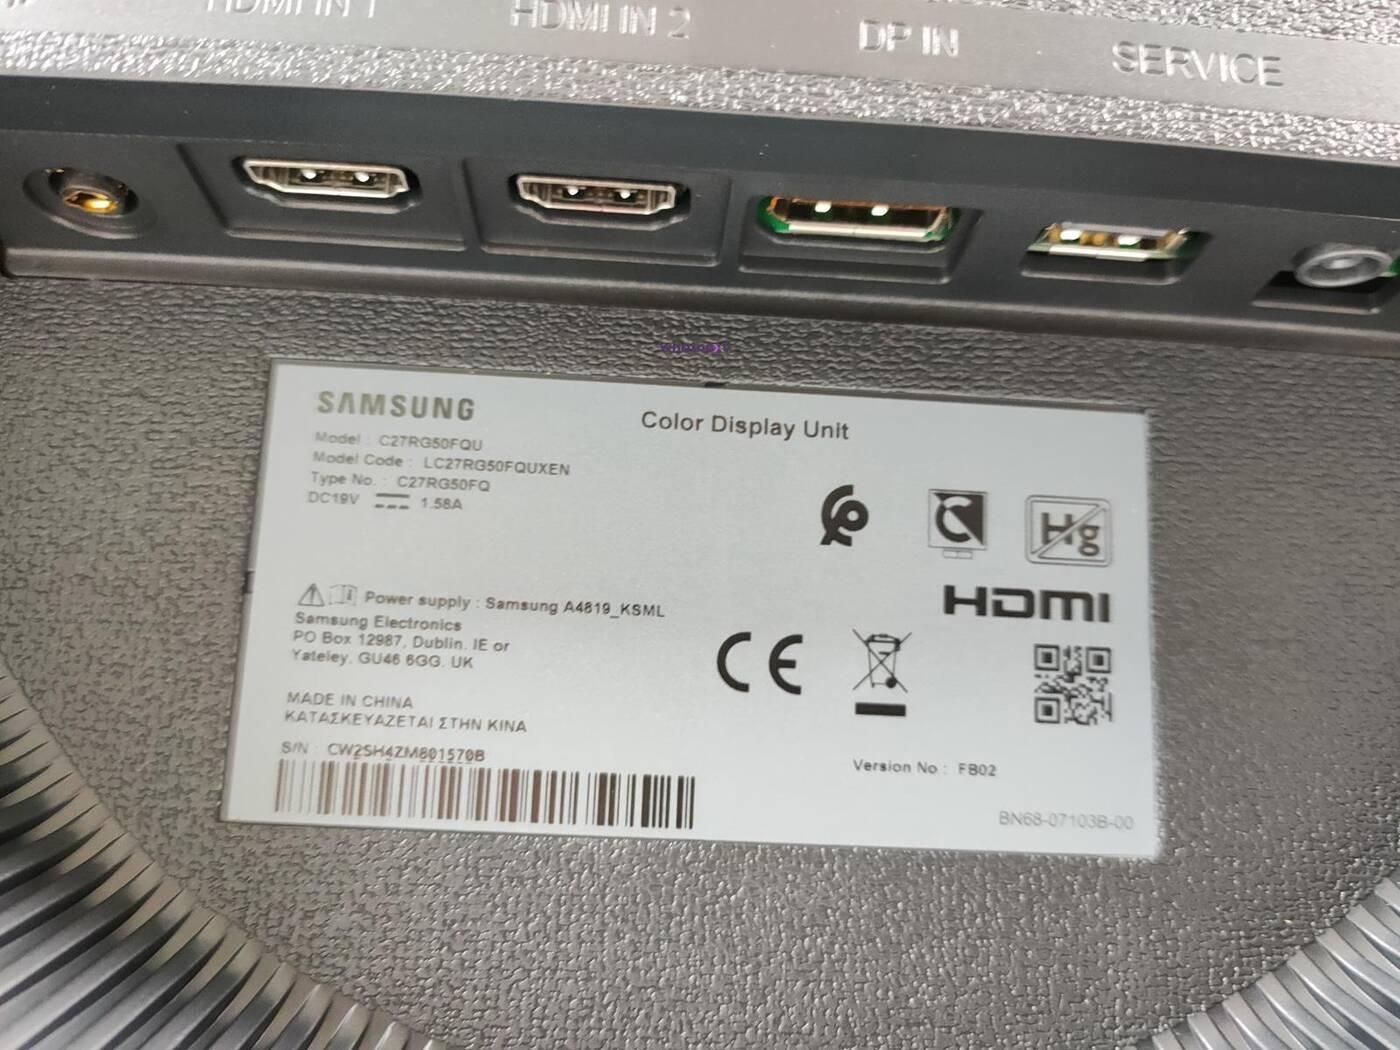 test Samsung C27RG50FQU, recenzja Samsung C27RG50FQU, review Samsung C27RG50FQU, opinia Samsung C27RG50FQU